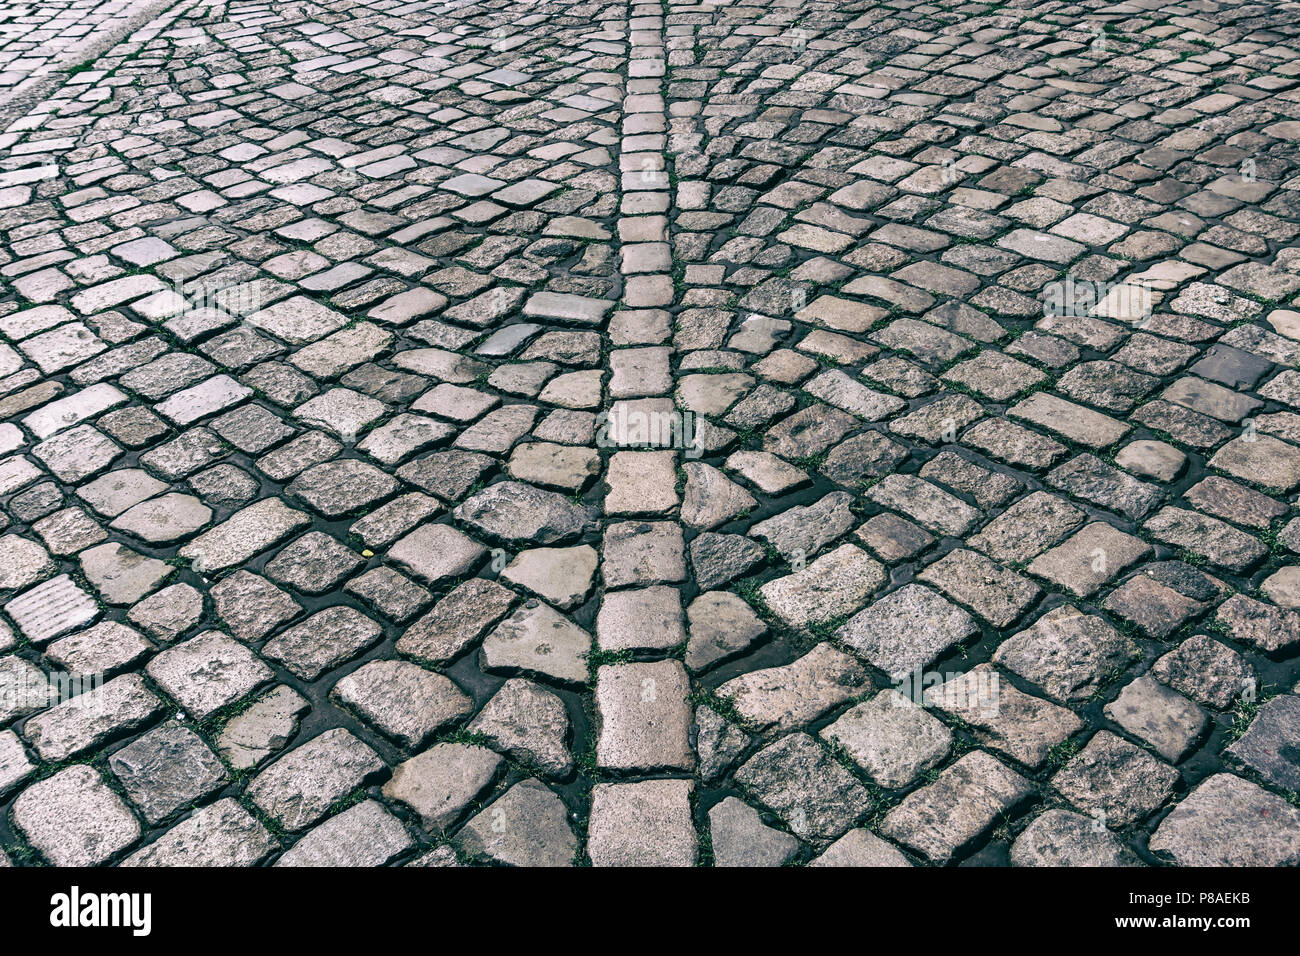 Hamburg , Germany, June 26, 2018: Close-Up of Cobblestone Sidewalk - Stock Image